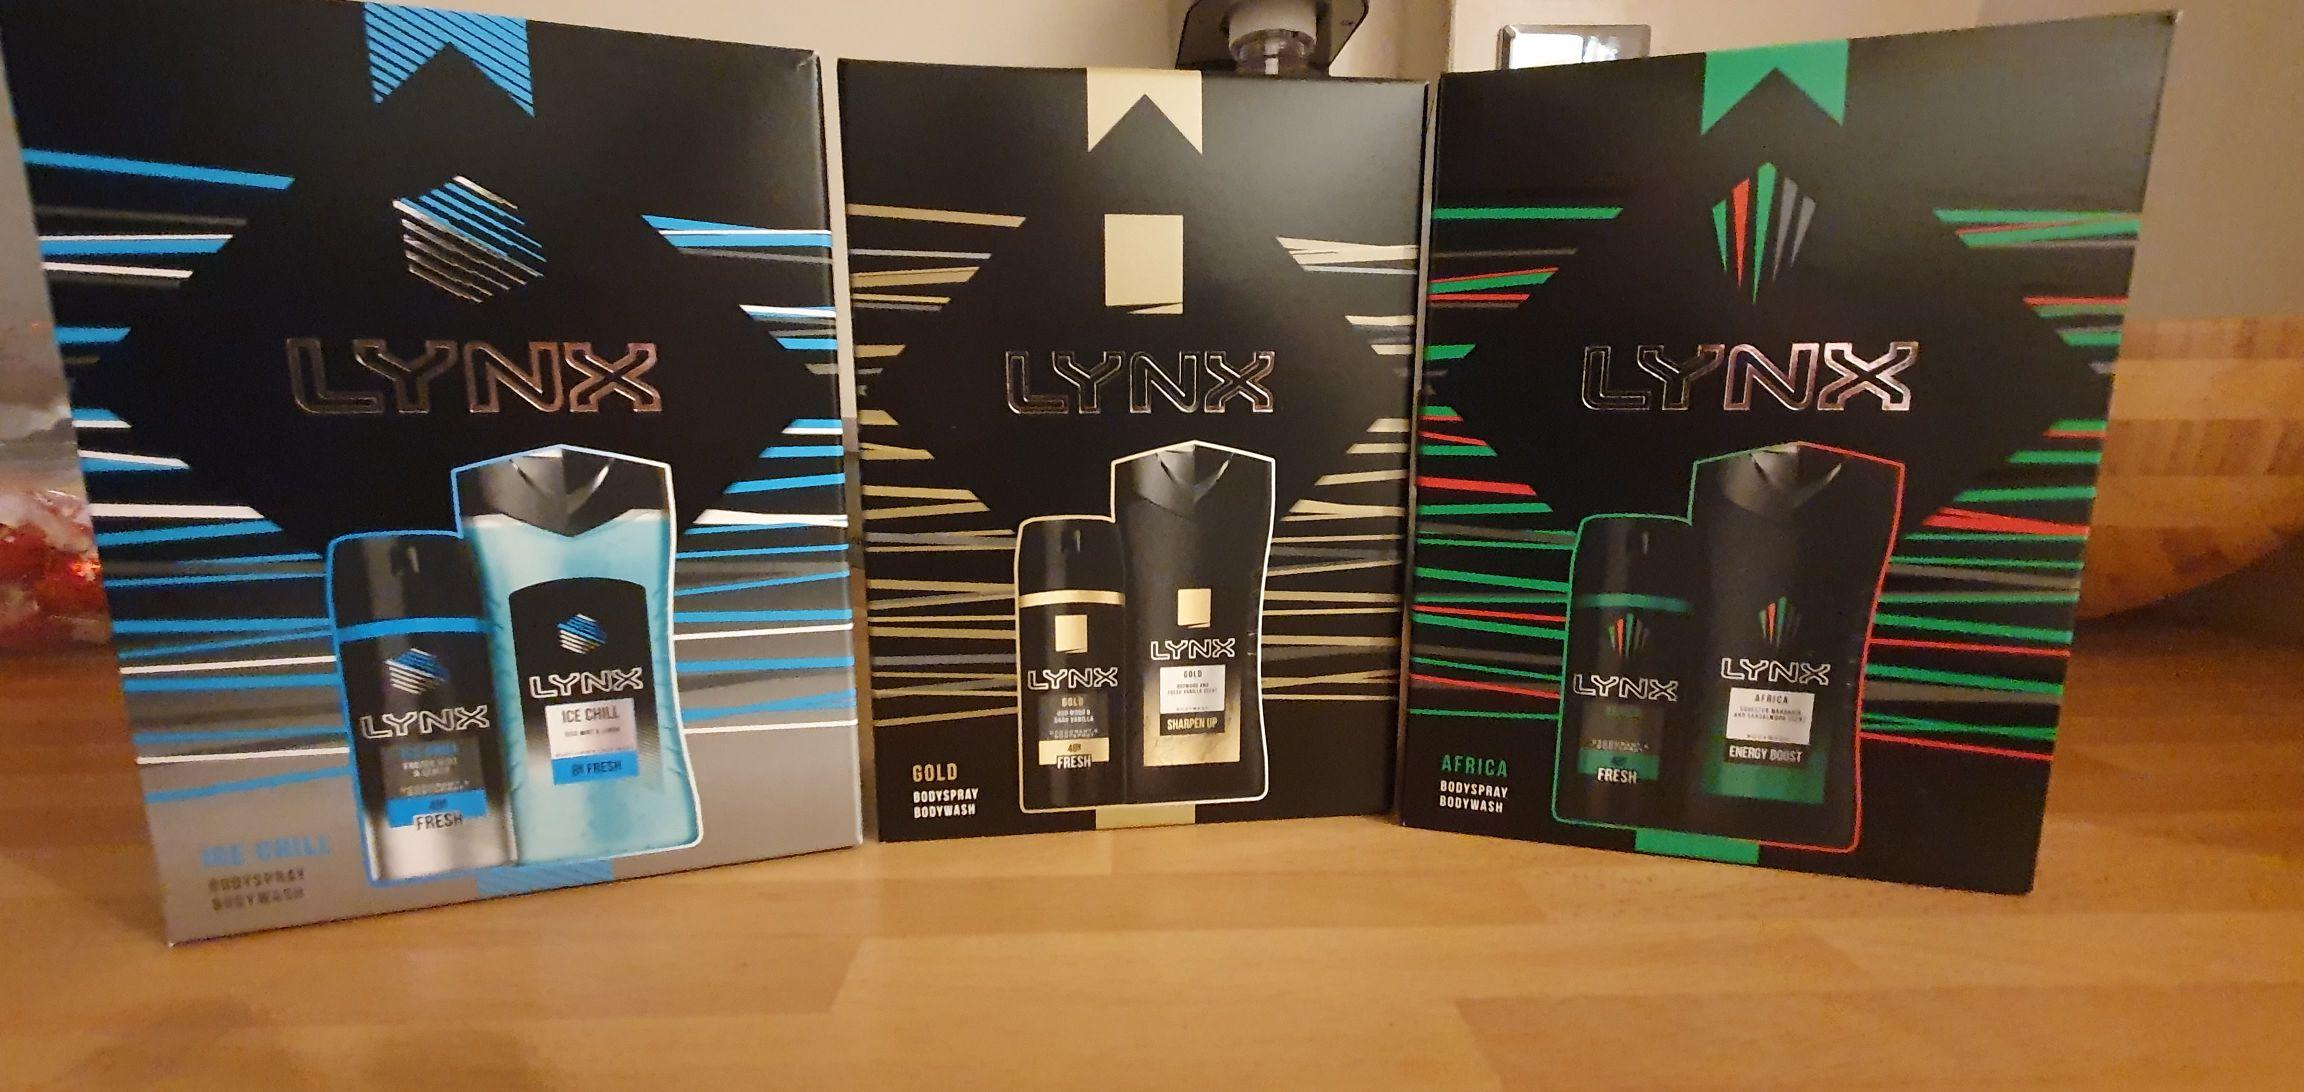 Lynx Gift Sets £1.50 @ Tesco Sunbury